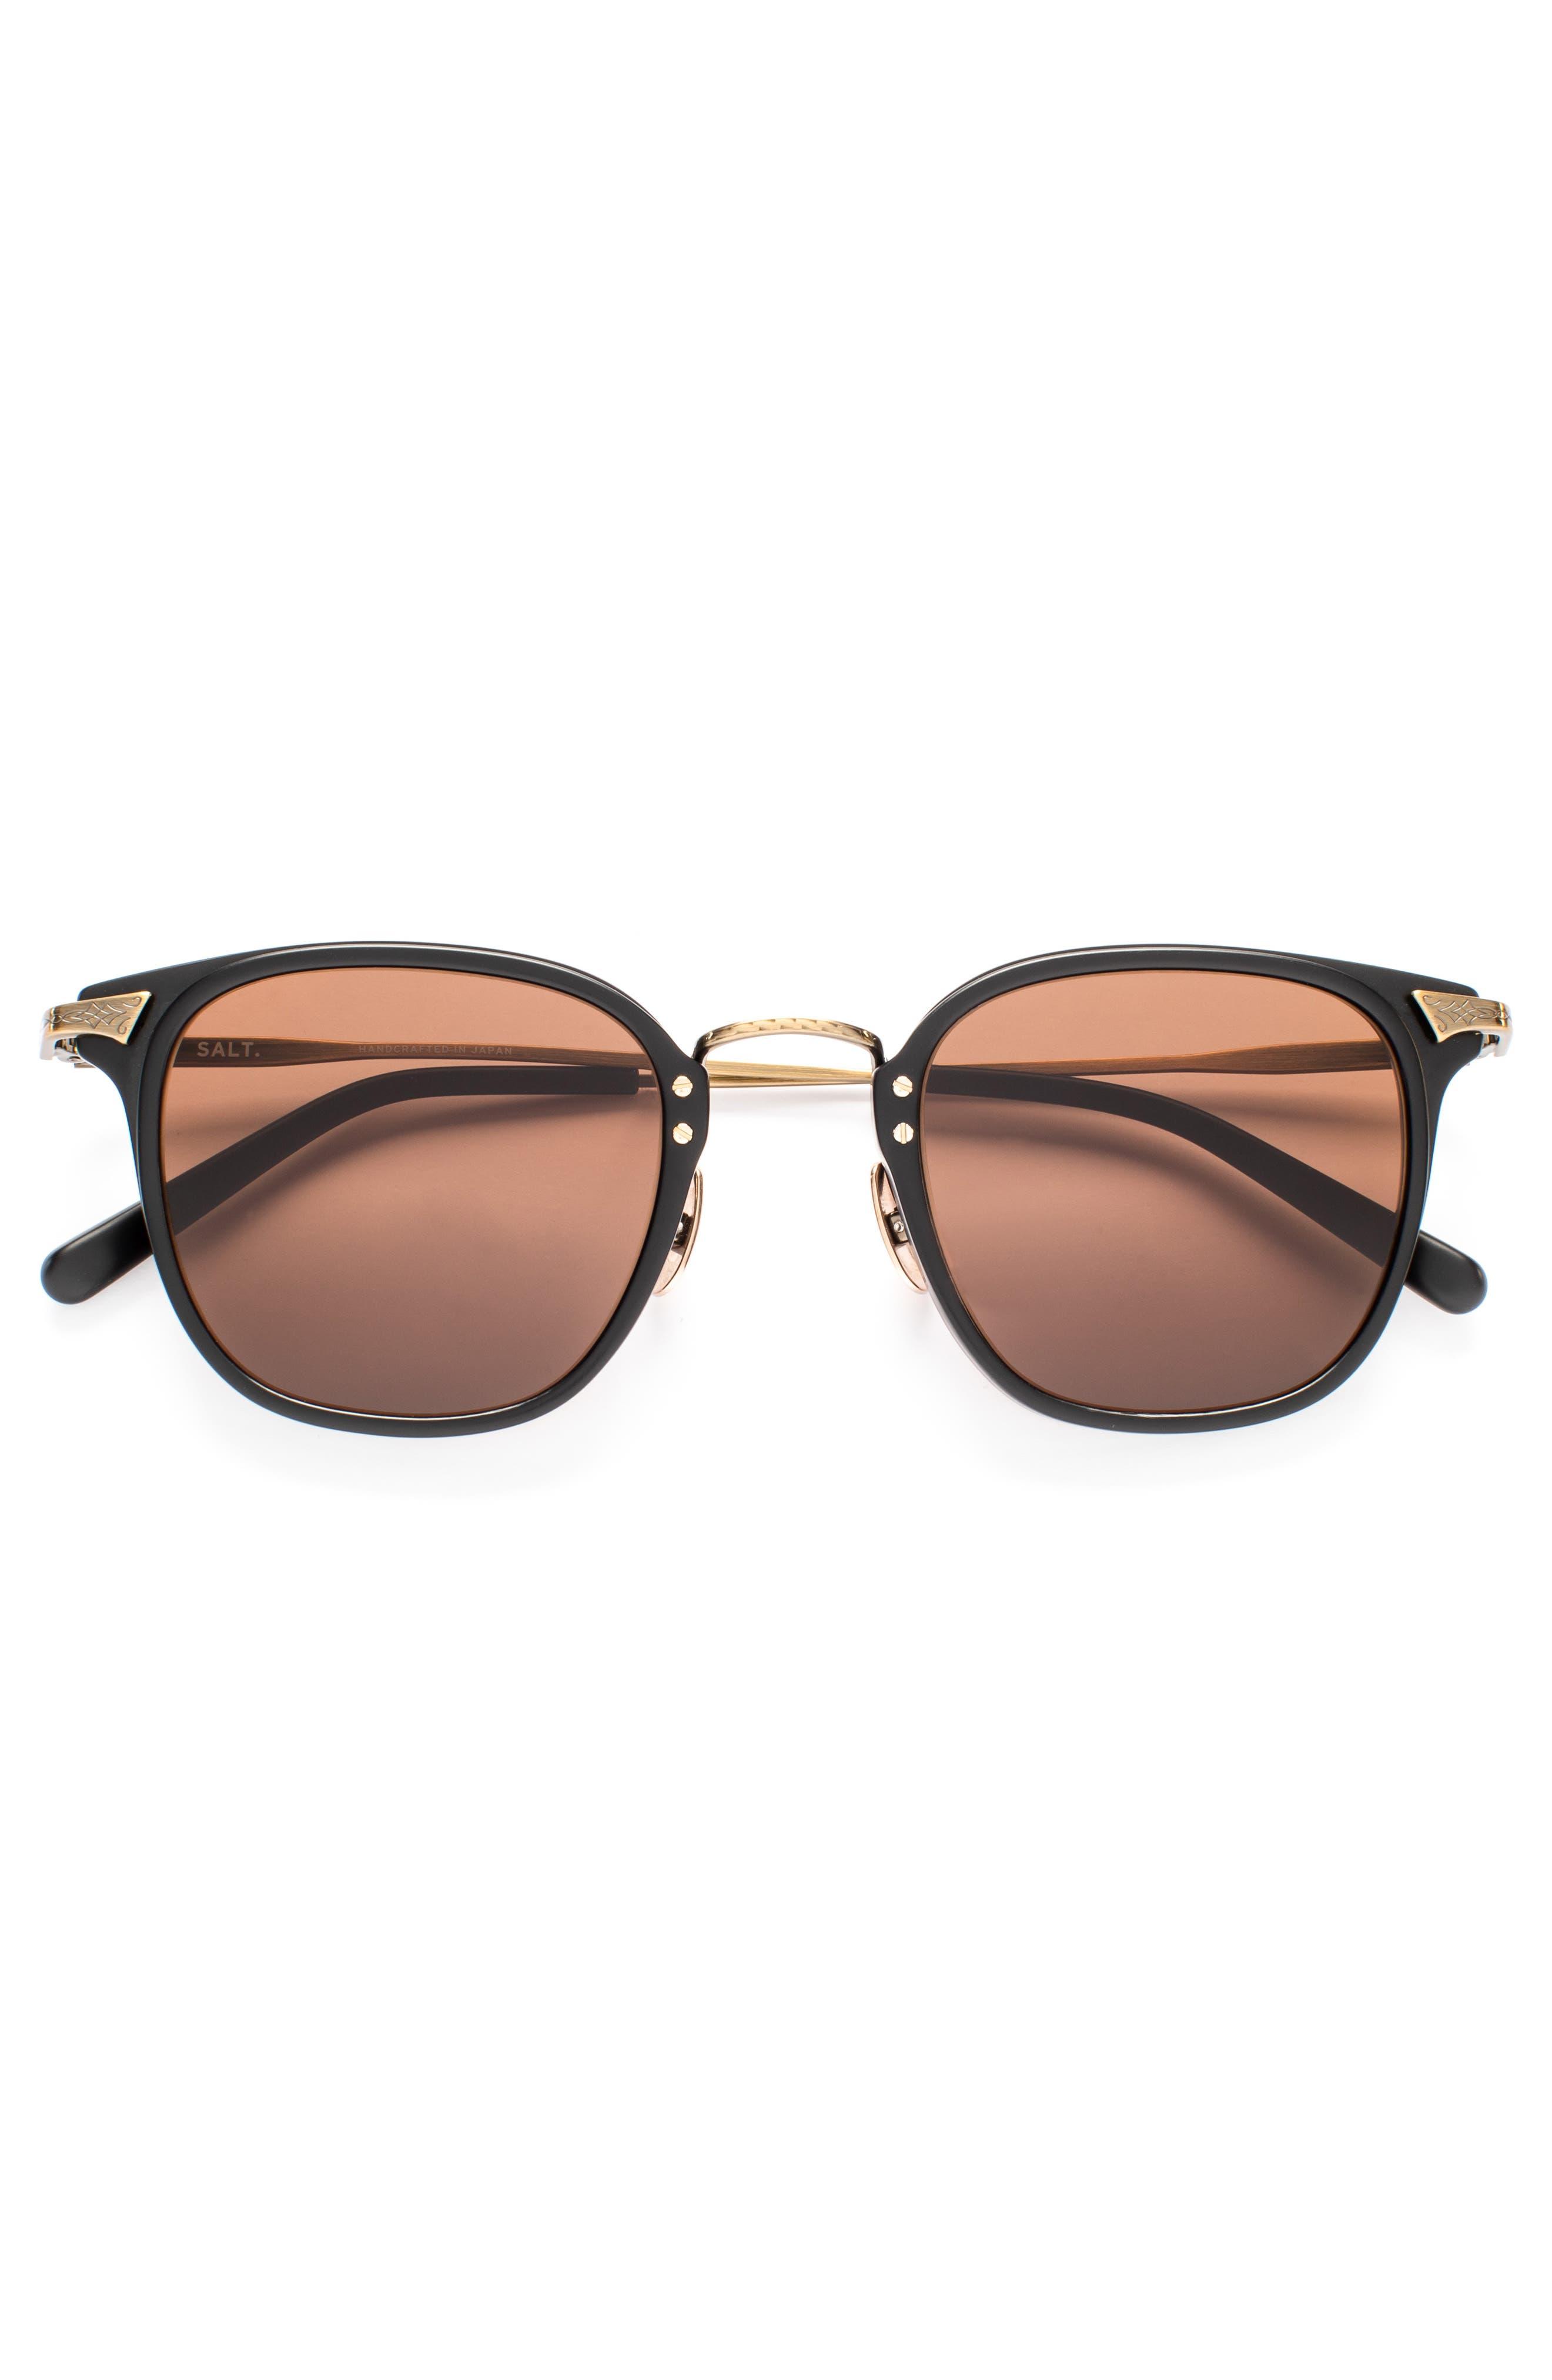 Hamilton 48mm Polarized Sunglasses,                             Alternate thumbnail 2, color,                             MATTE BLACK / ANTIQUE GOLD